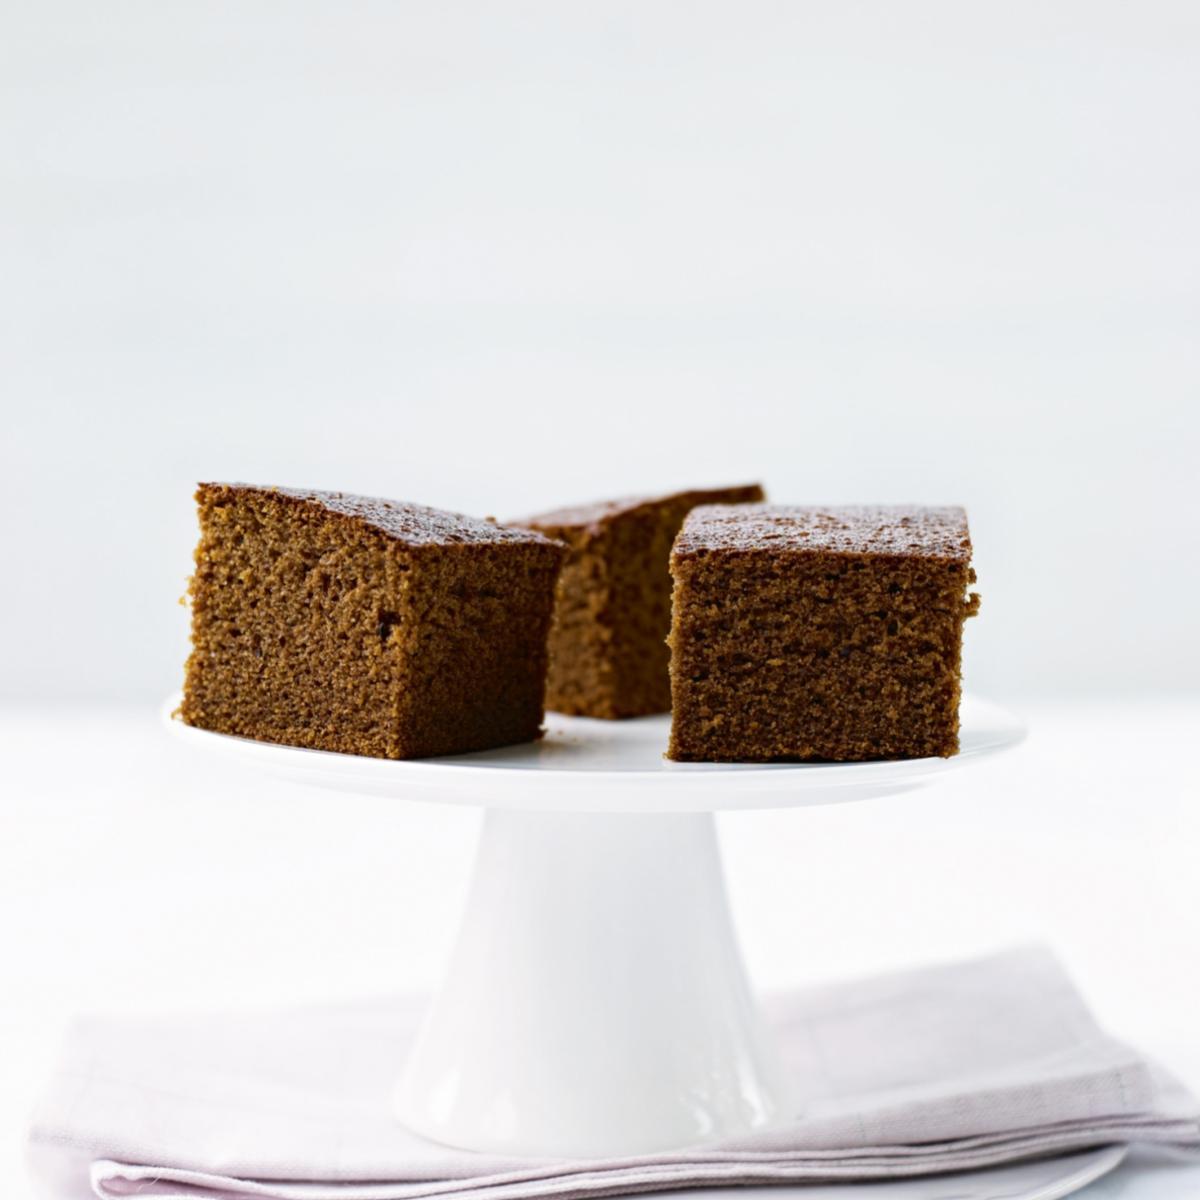 Cakes damp gingerbread